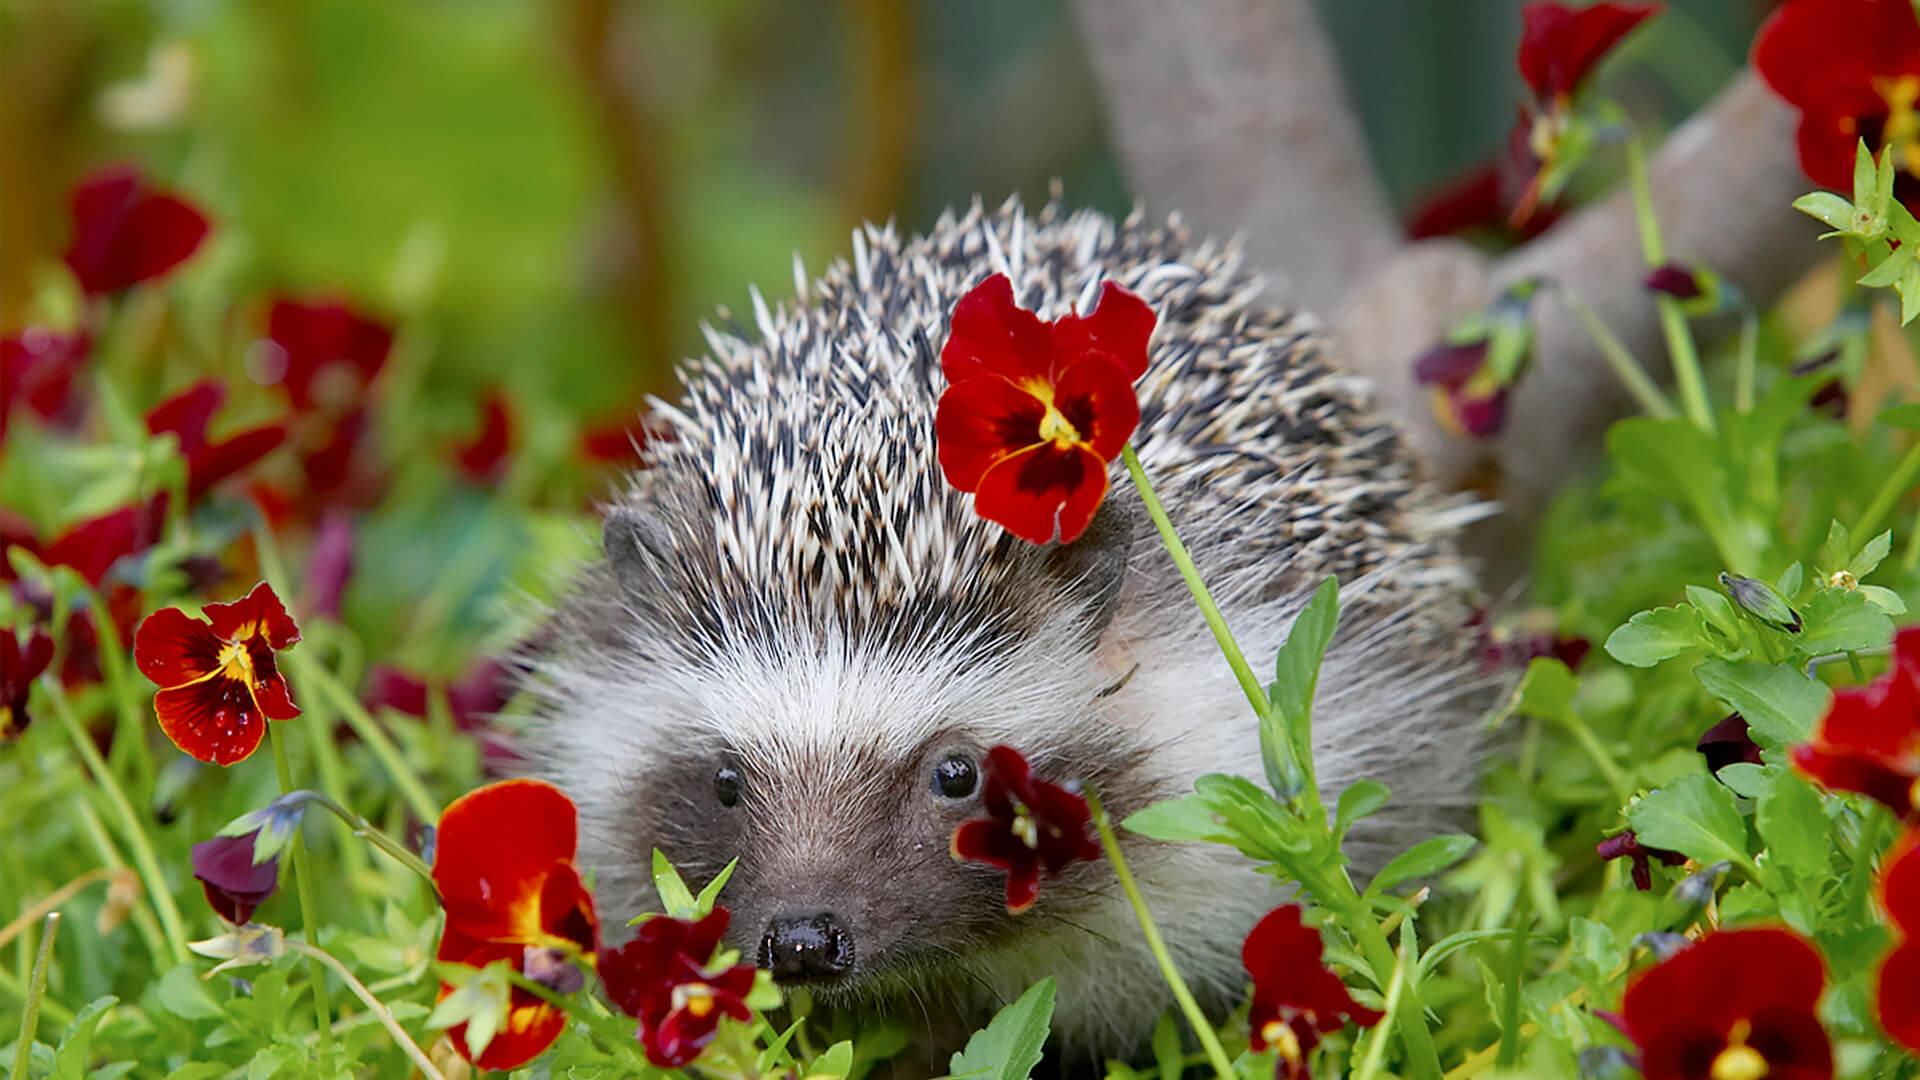 Hedgehog San Diego Zoo Animals Amp Plants